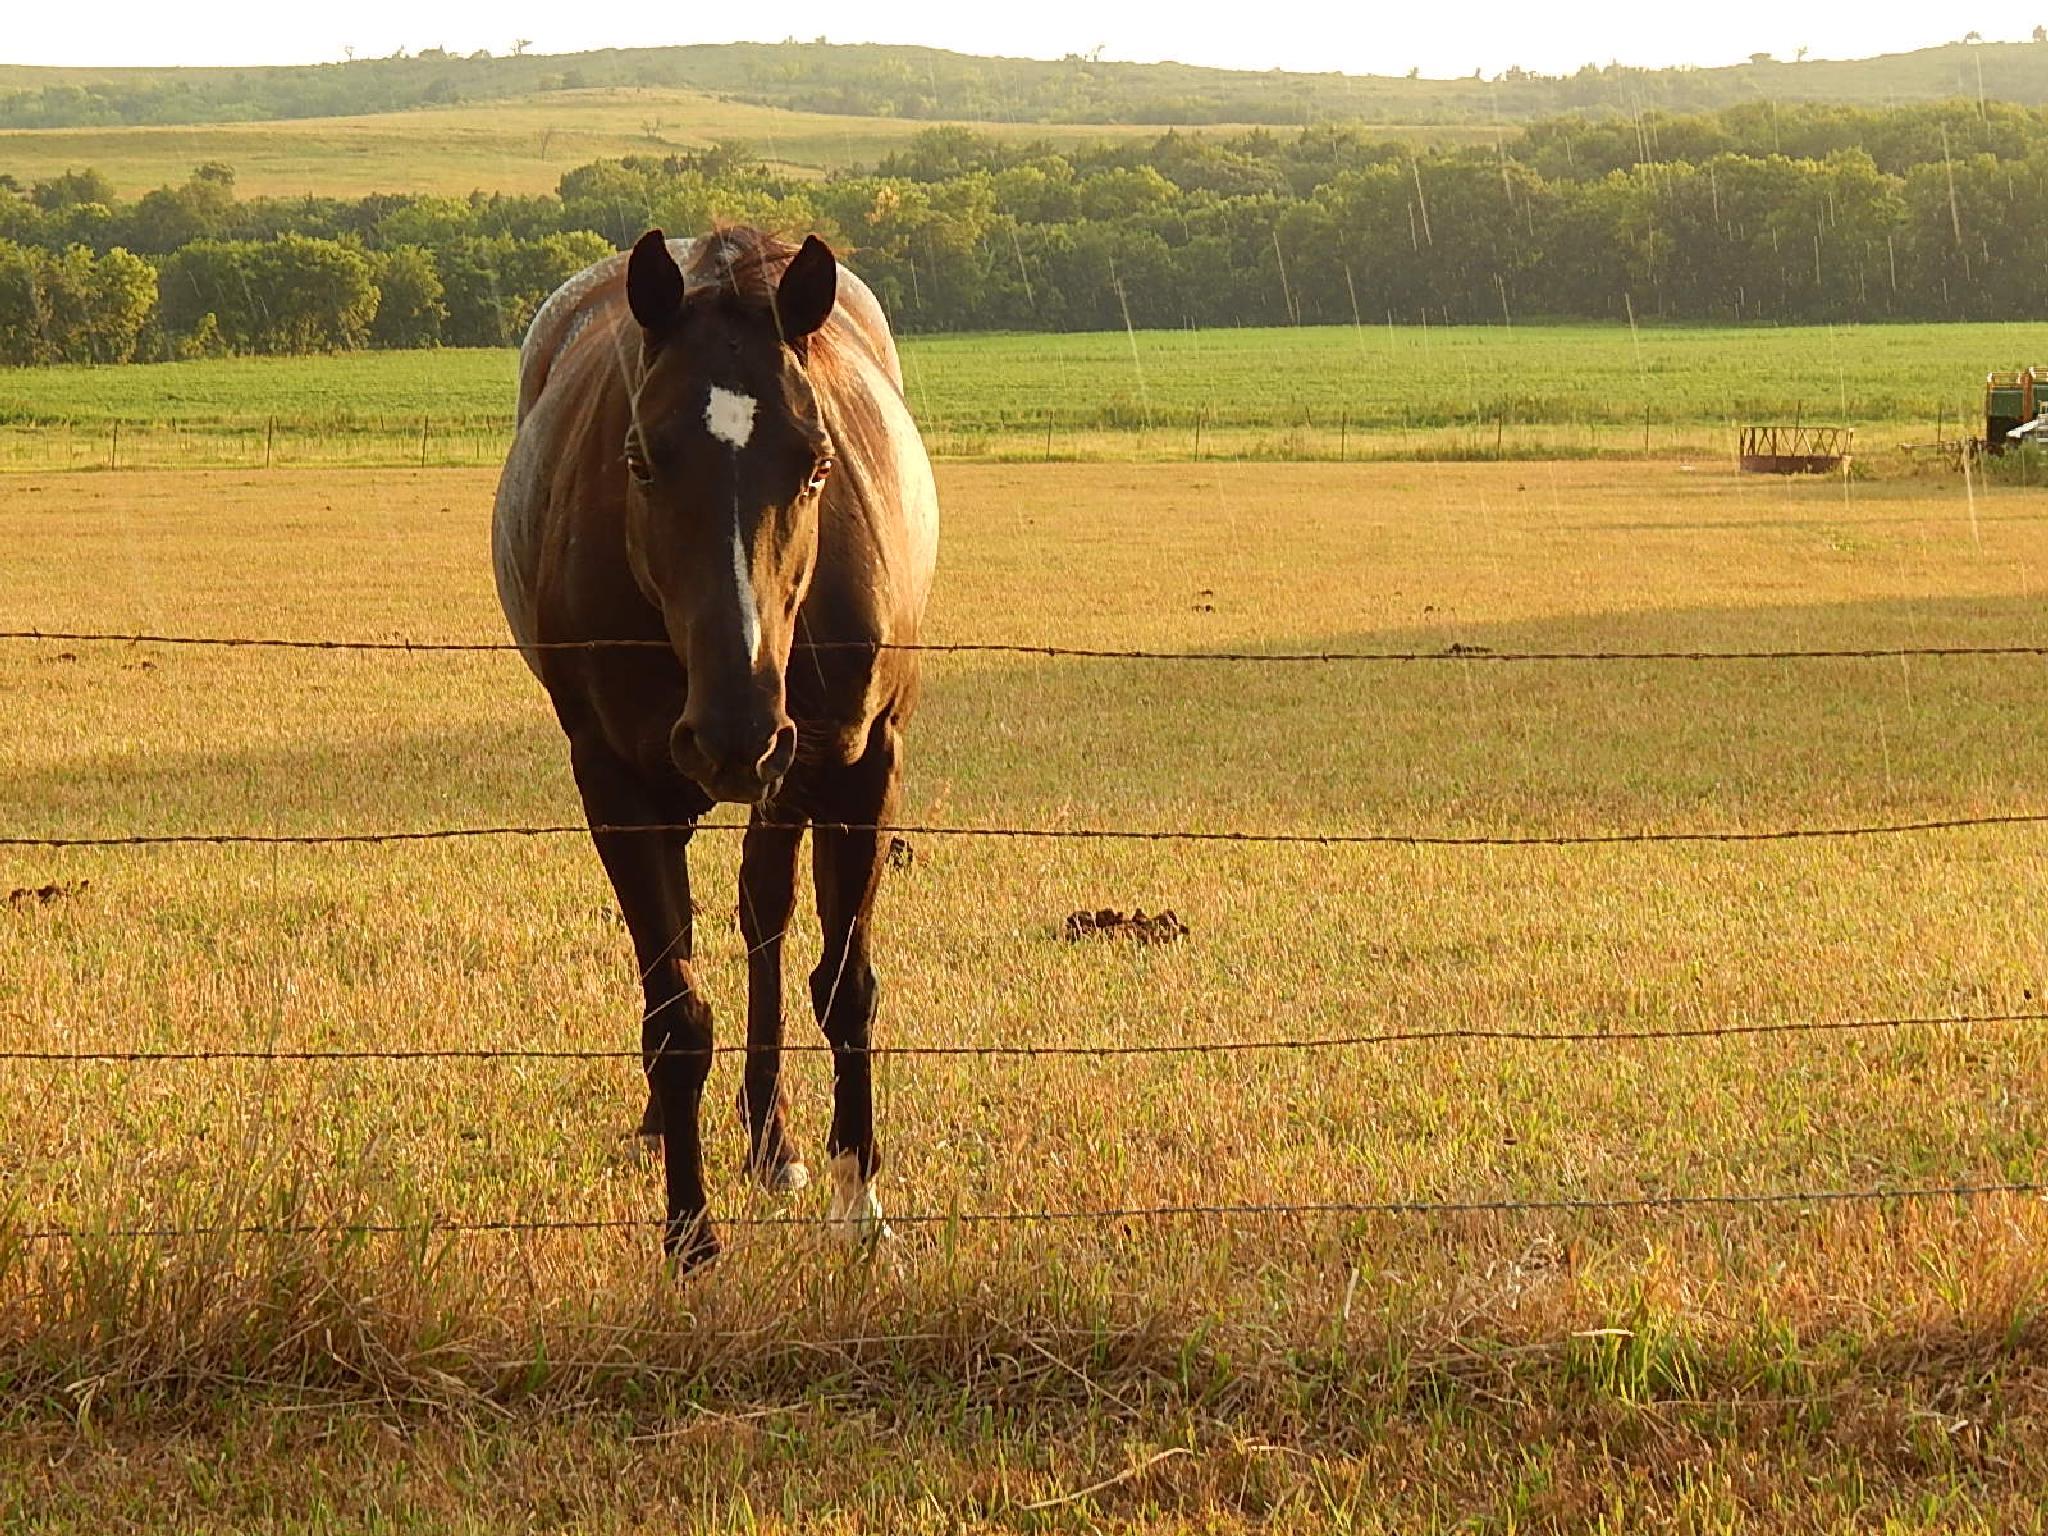 Horse by Marsha Furman